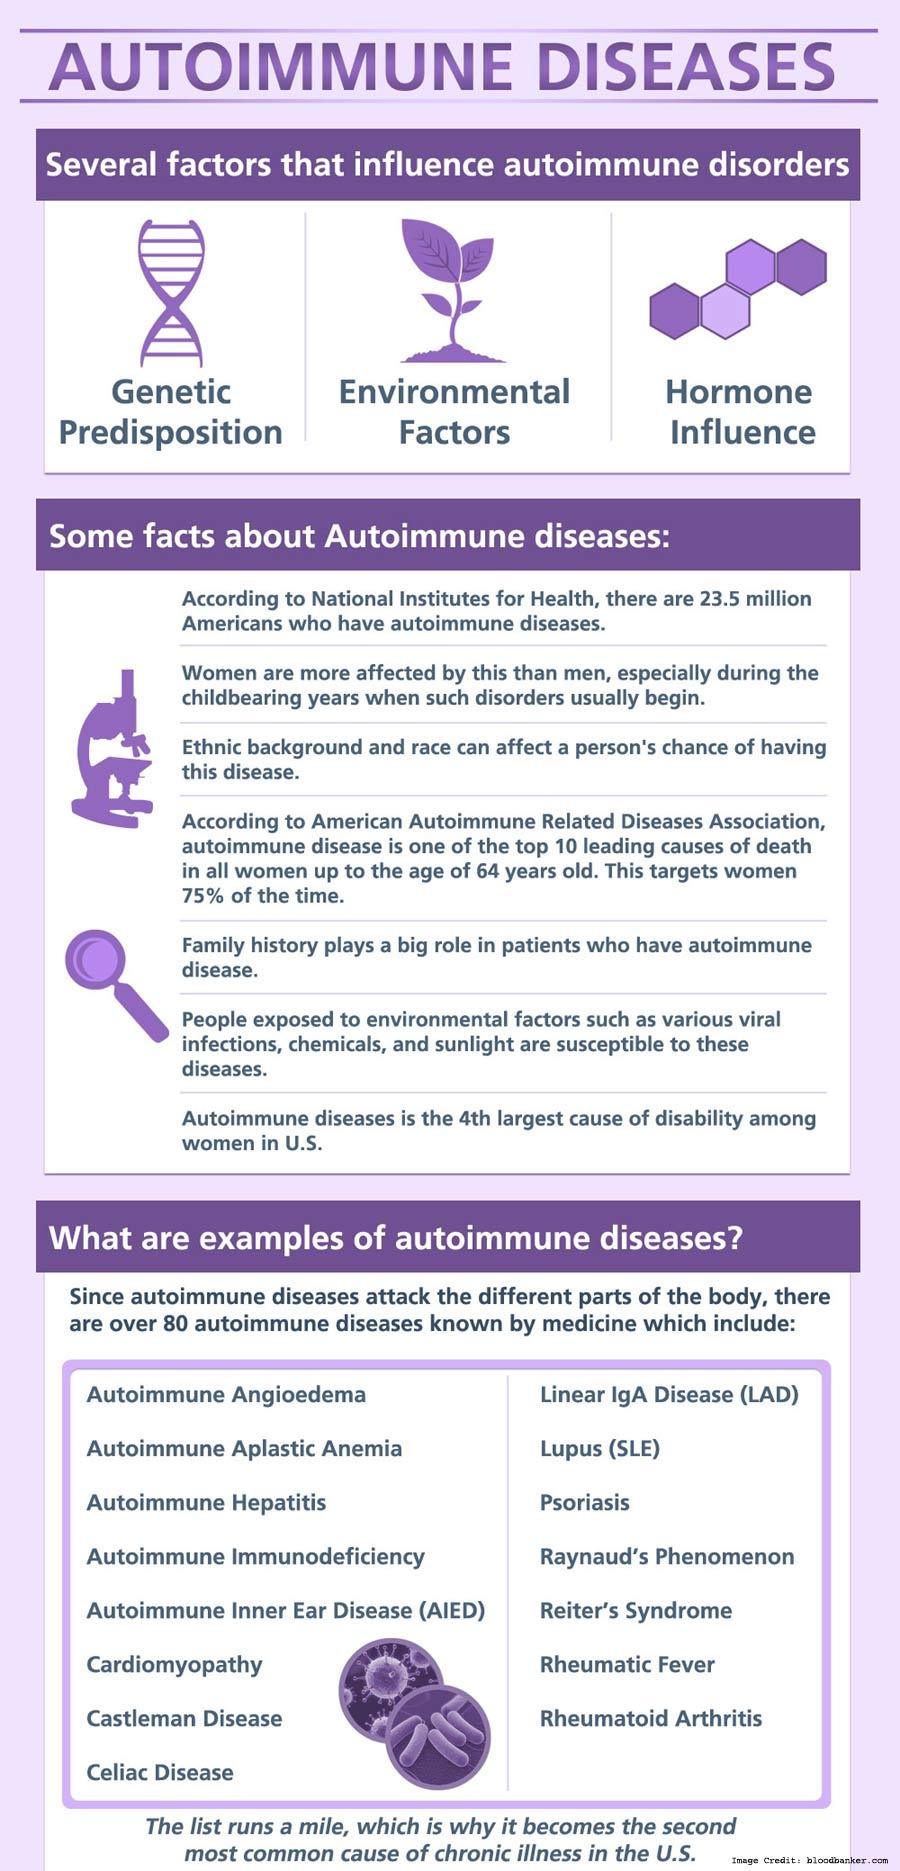 Autoimmune Diseases Info